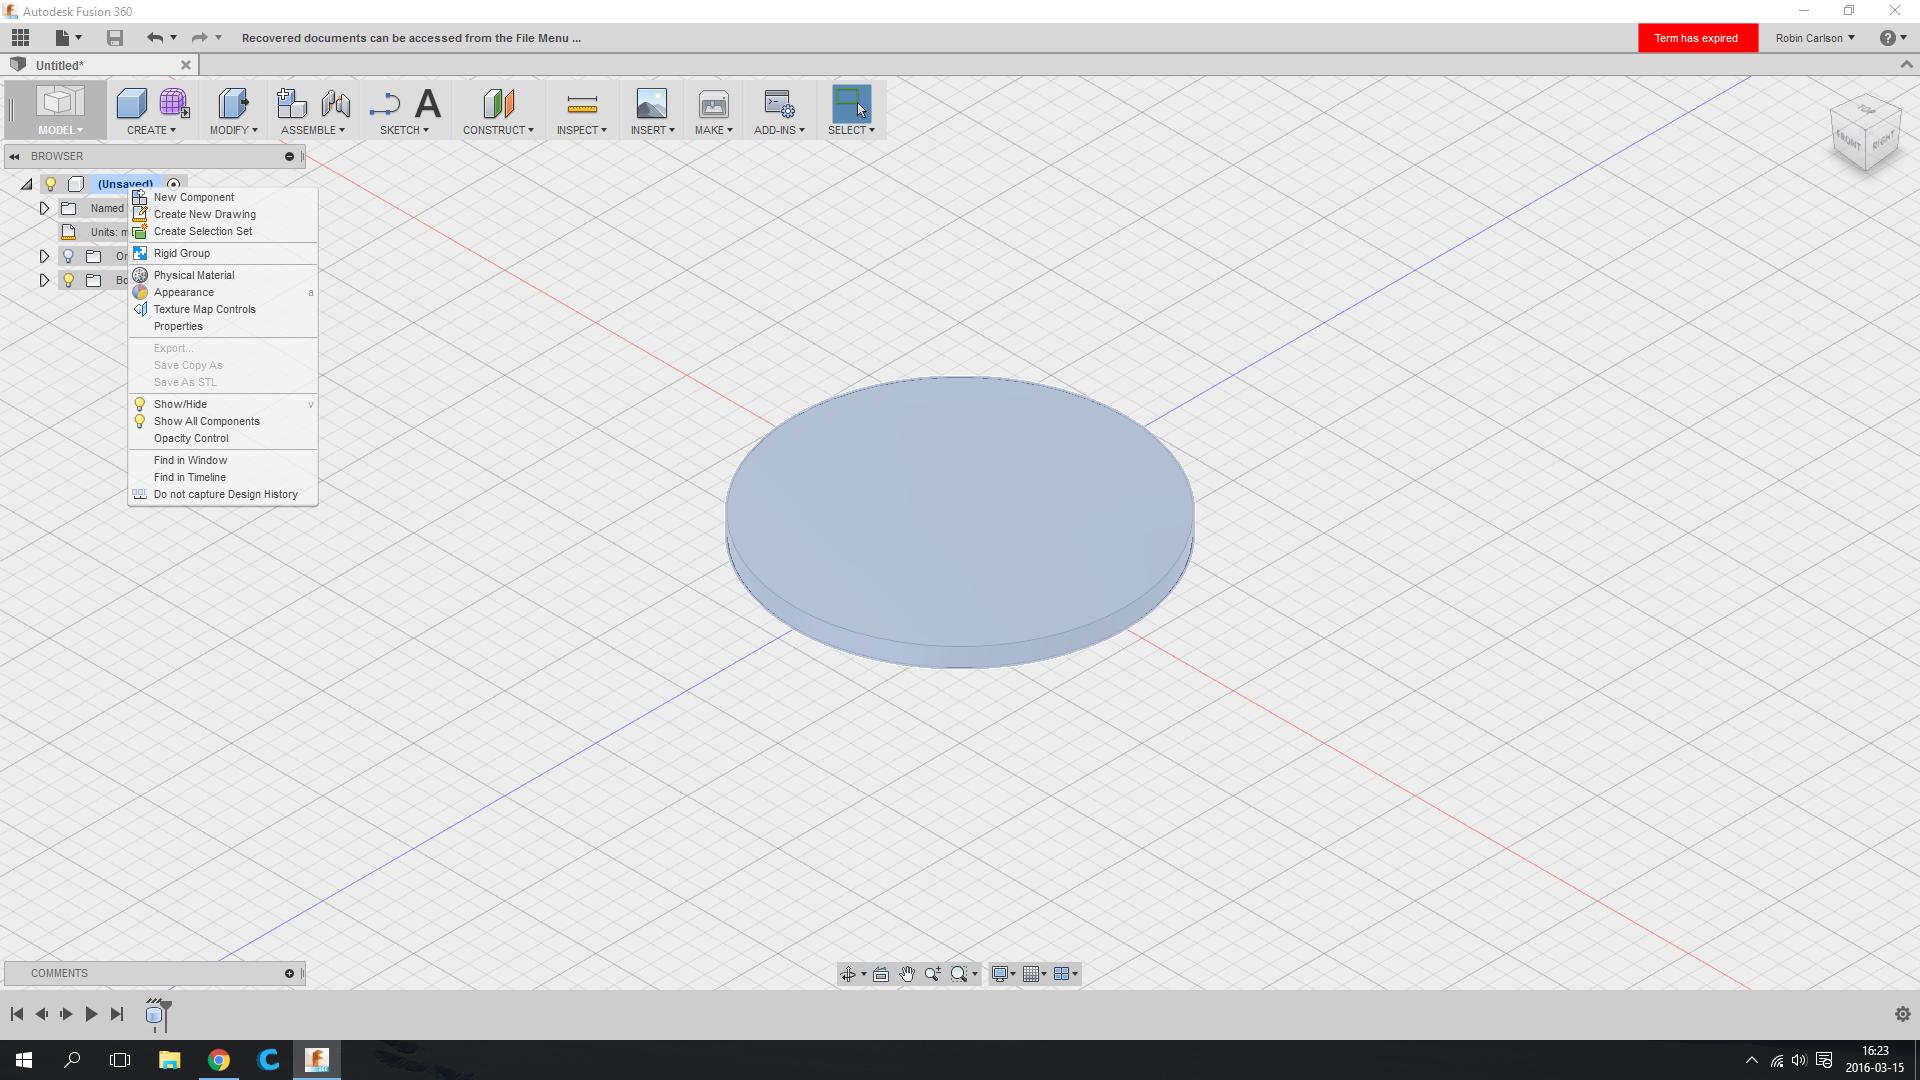 Autodesk fusion 360 - 3D modeling software - Ultimaker